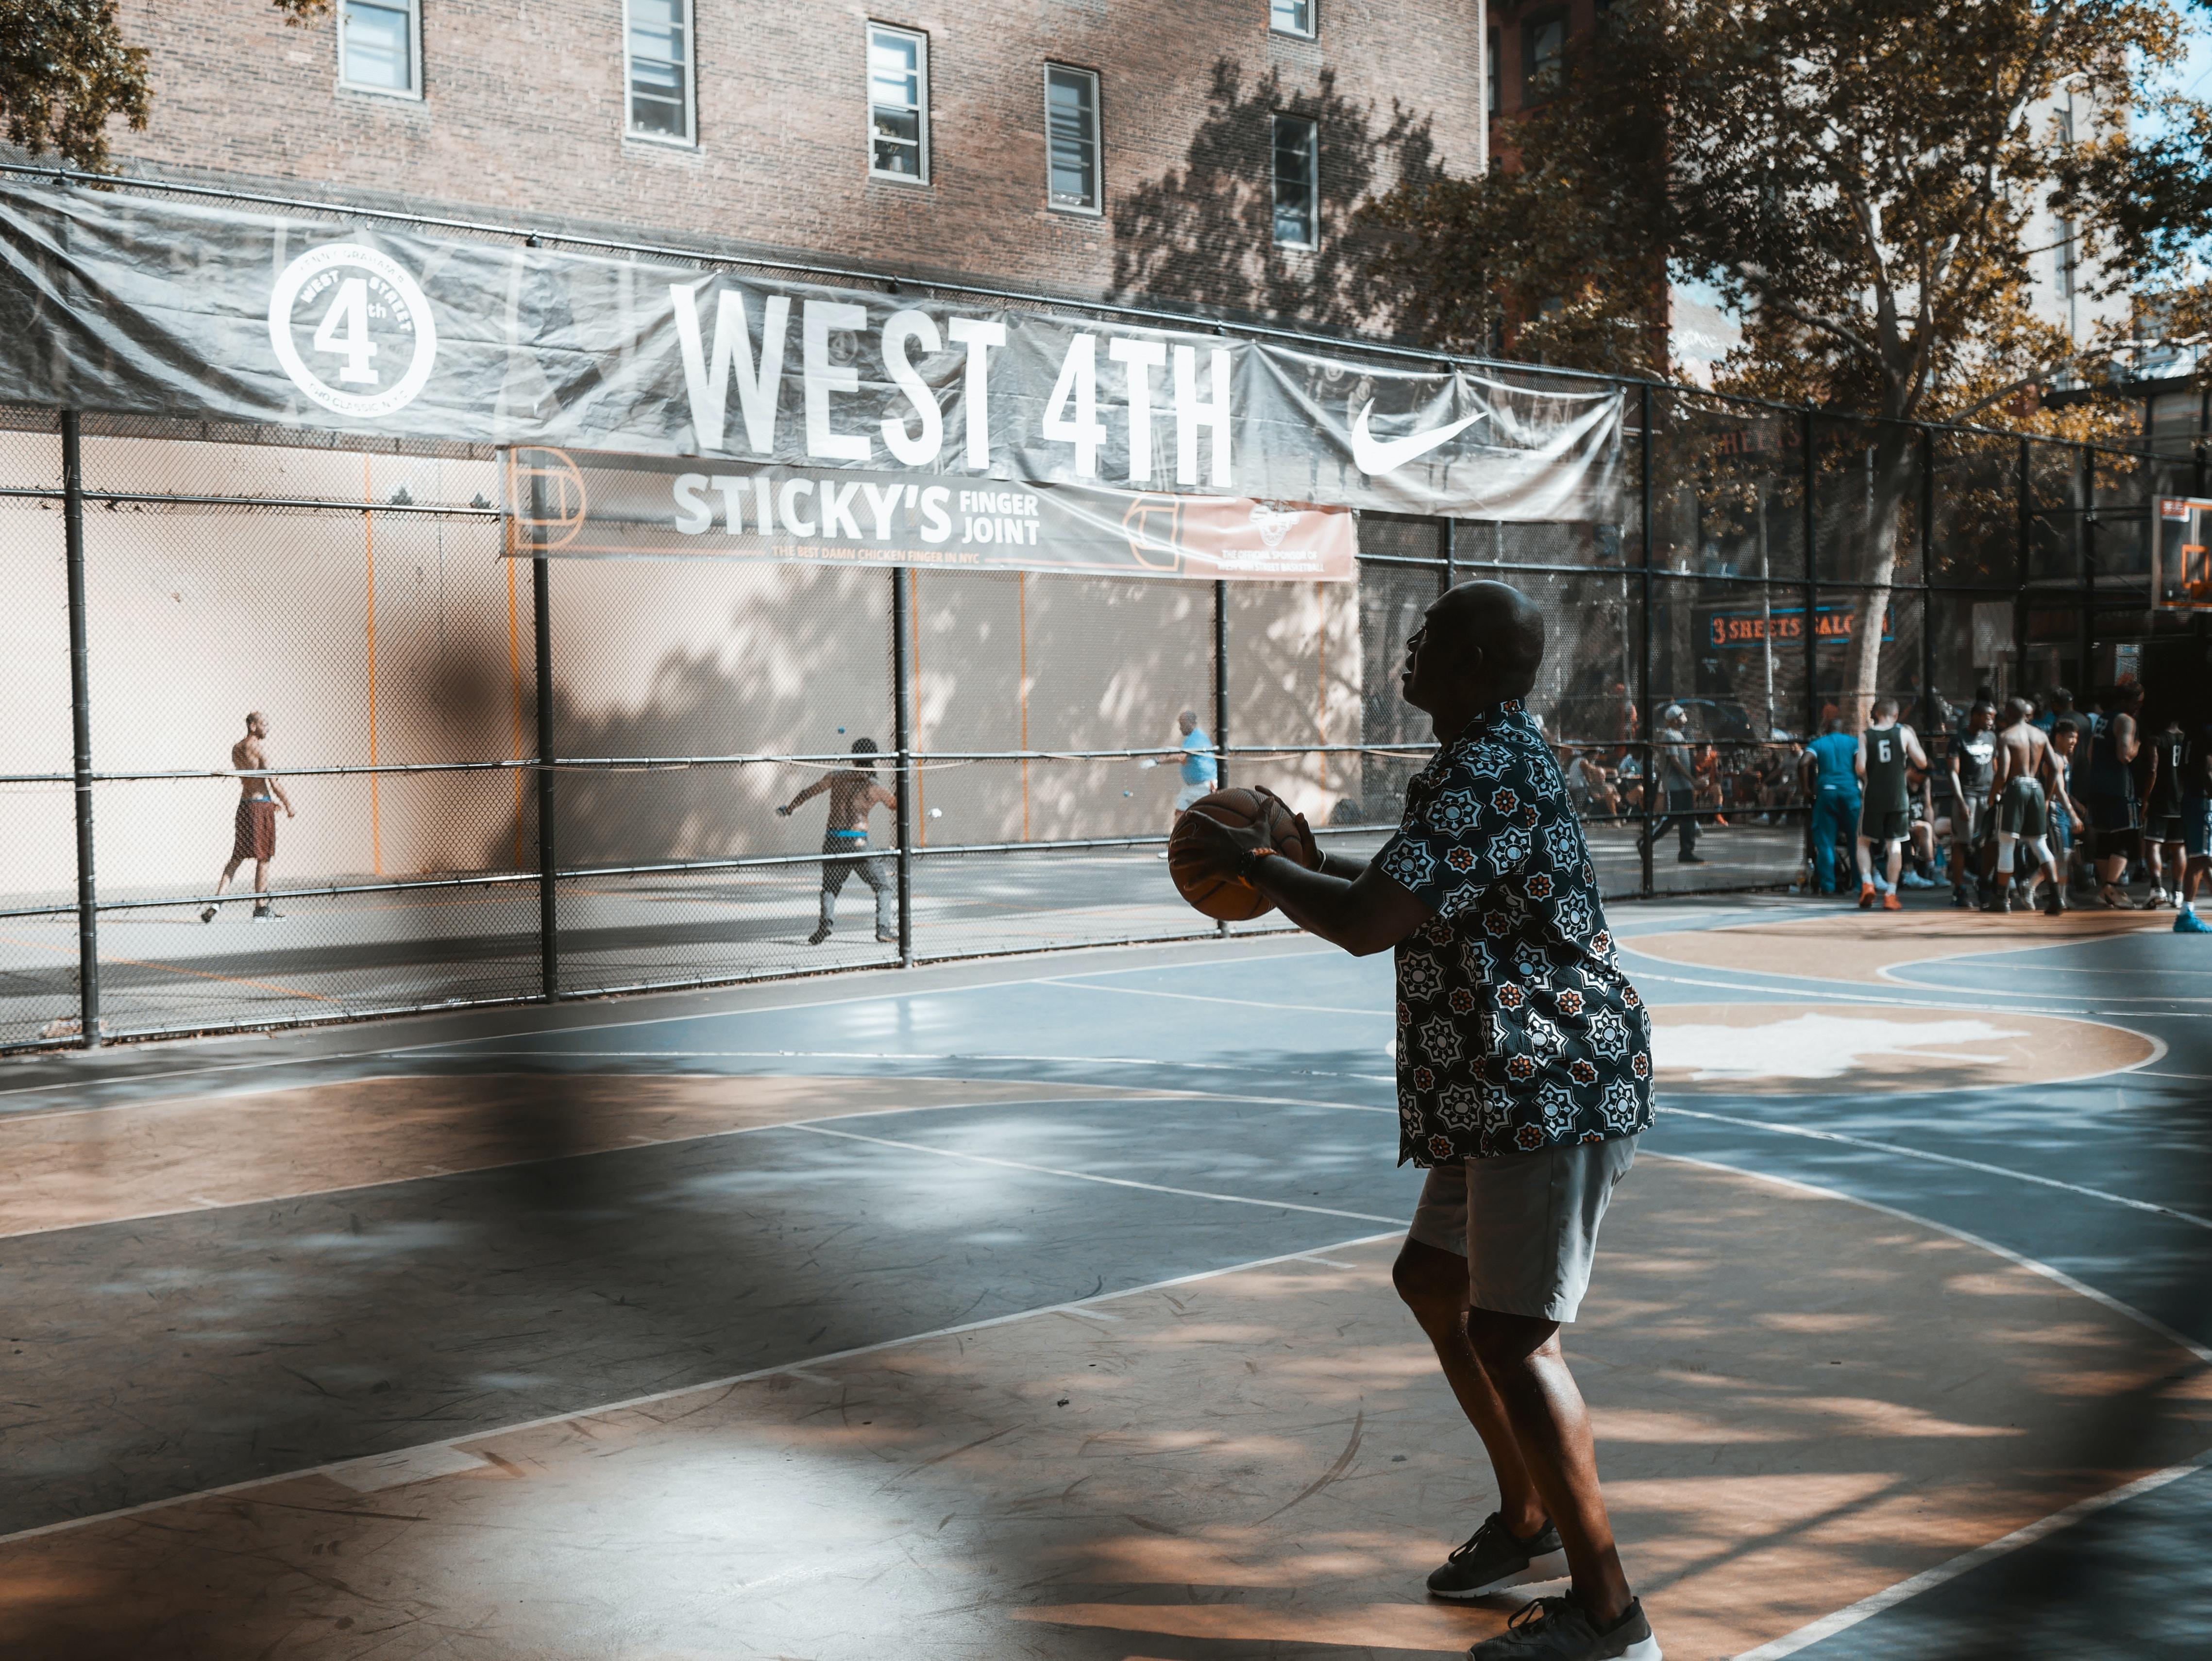 man holding ball on court